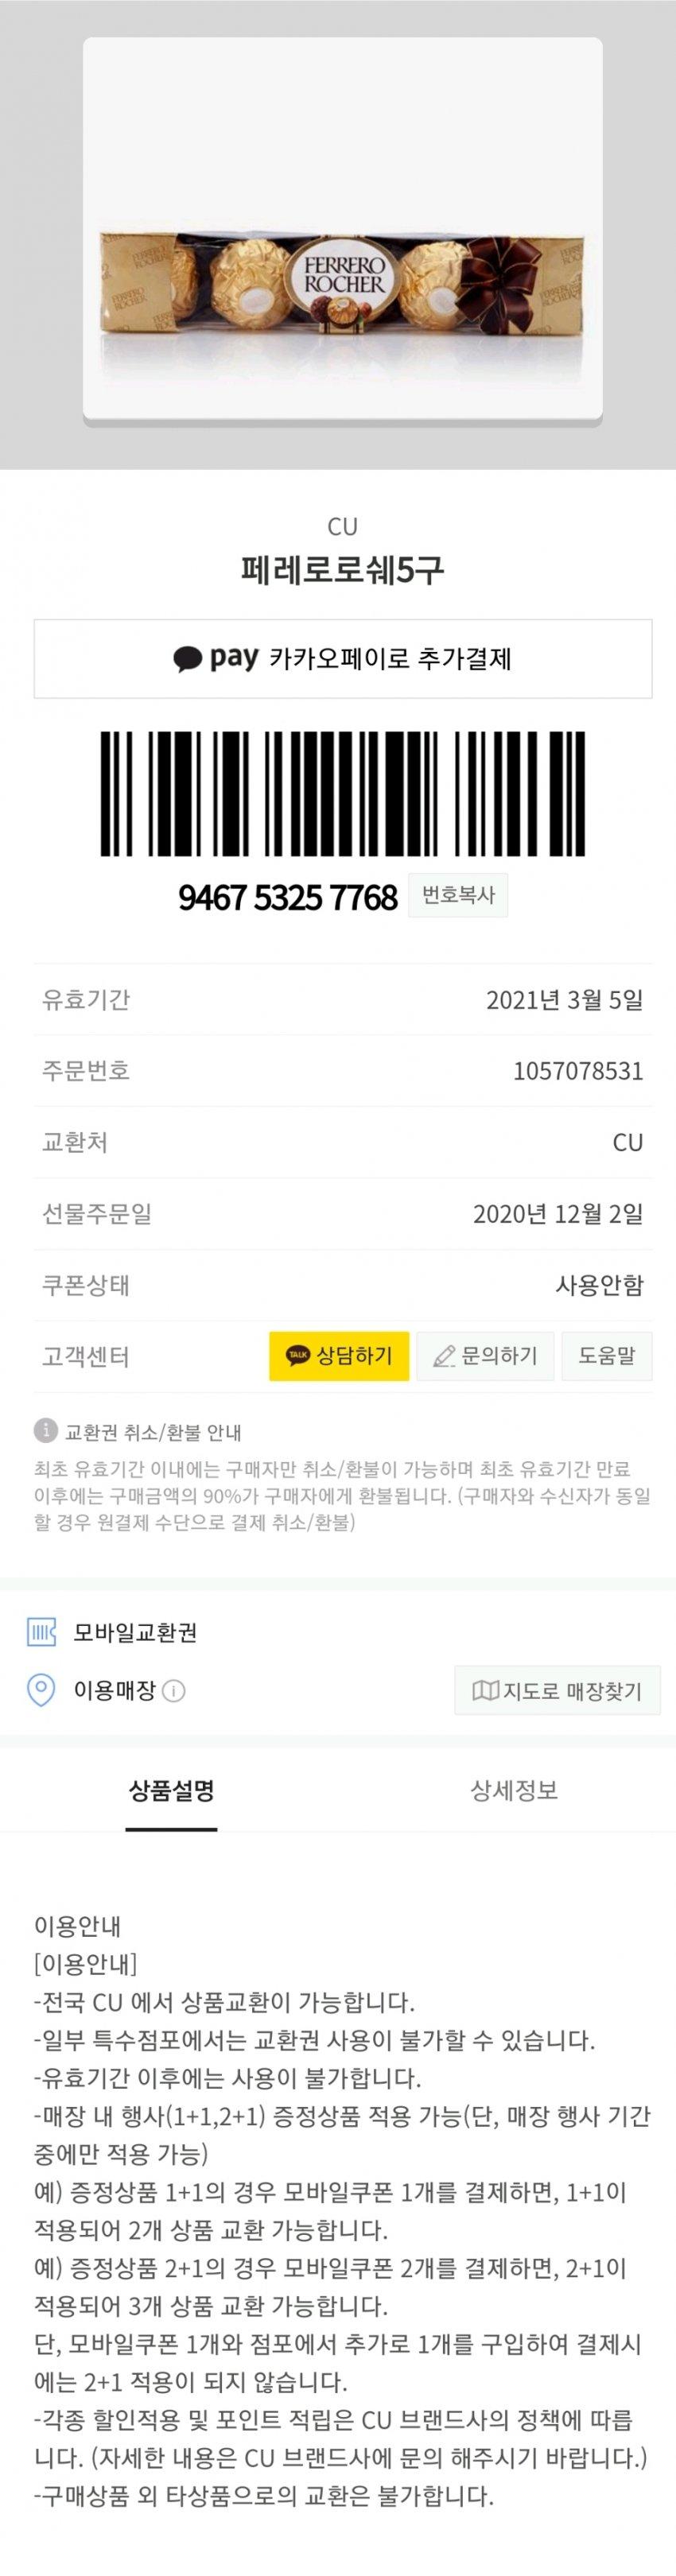 viewimage.php?id=39b5d527f1d72a8b&no=24b0d769e1d32ca73dec84fa11d0283195504478ca9b7677dc322e30c9369b41f230f39fe14019246ea3823bbb7675d0e410ab9e370ac57b288e3512aeae4ef332adf8a046a6efc099db694d3a9d2991ea3fd7043e66440bee94278ea73d29402e6e18c0713e6a7b52